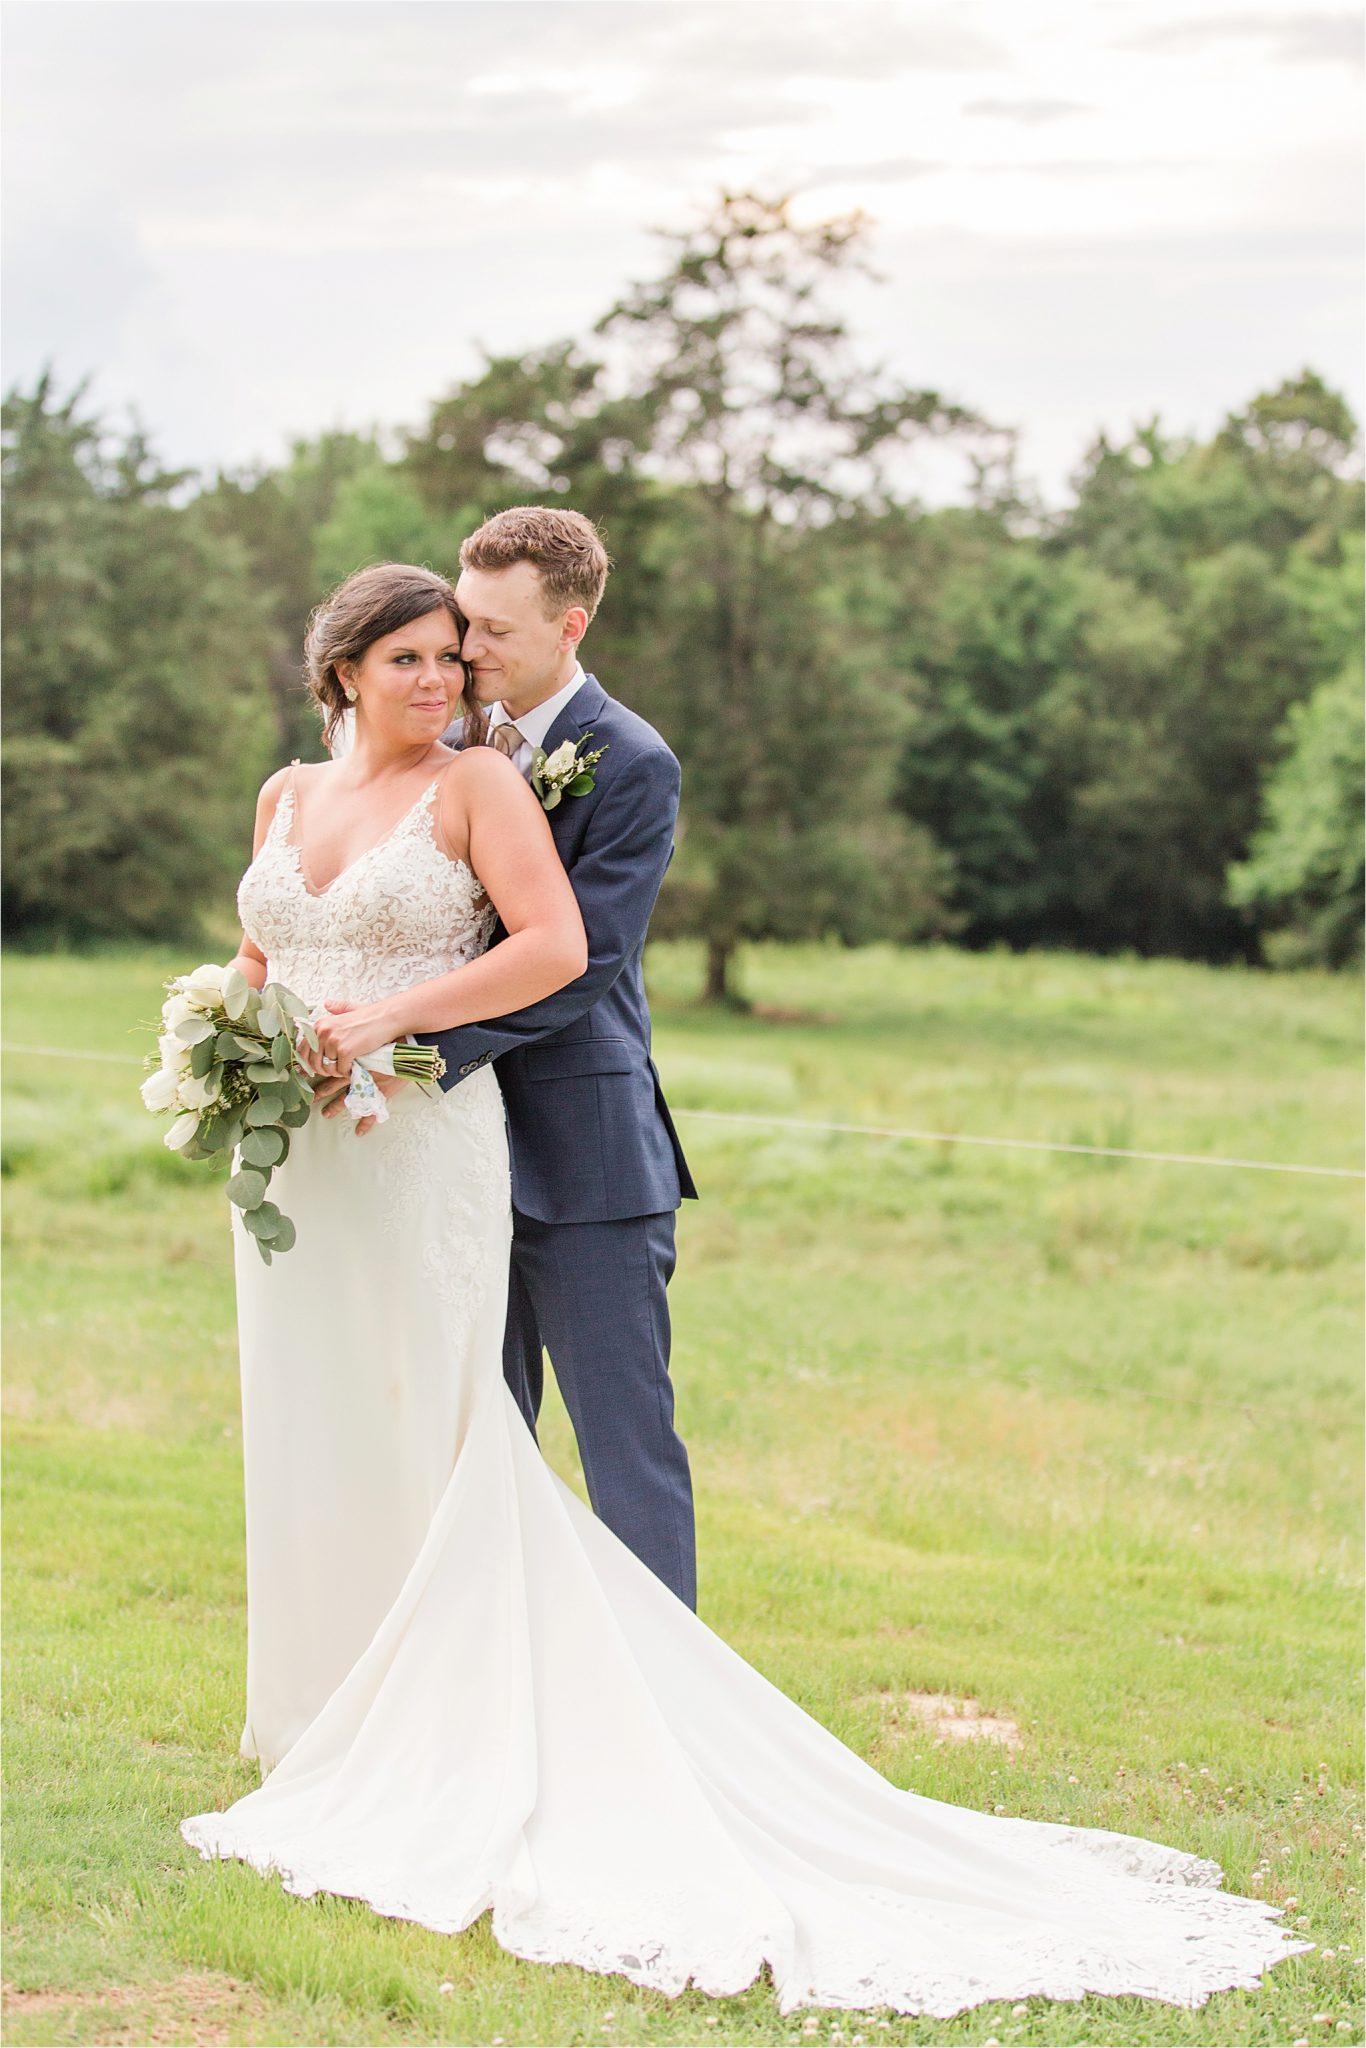 Hedge Farm Wedding, Alabama Wedding Photographer, Barn Wedding, navy and neutral themed wedding, bride and groom